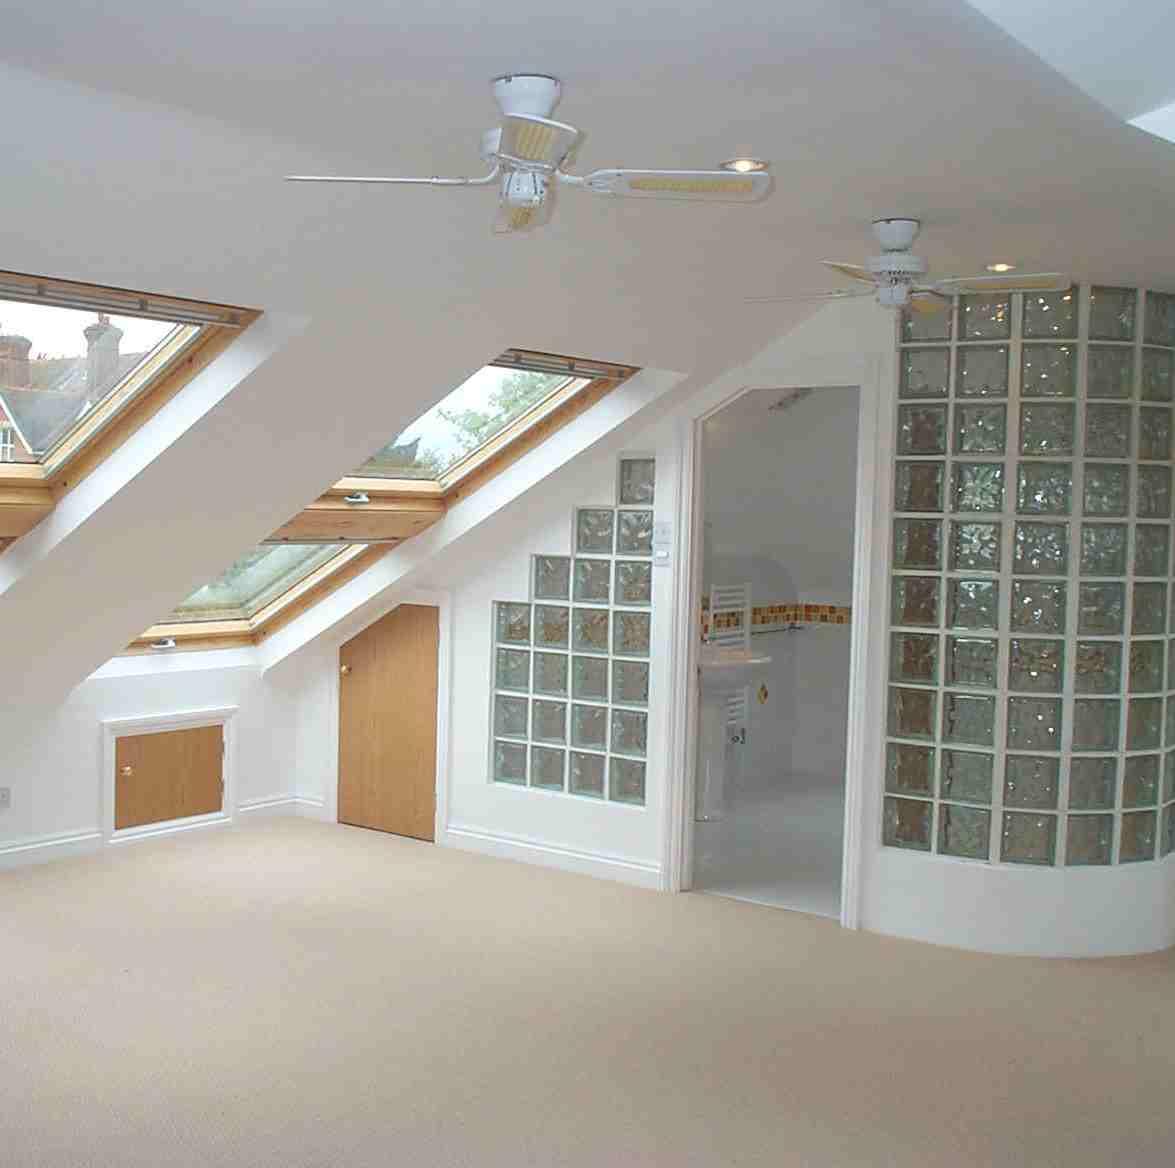 loft conversion with bathroom